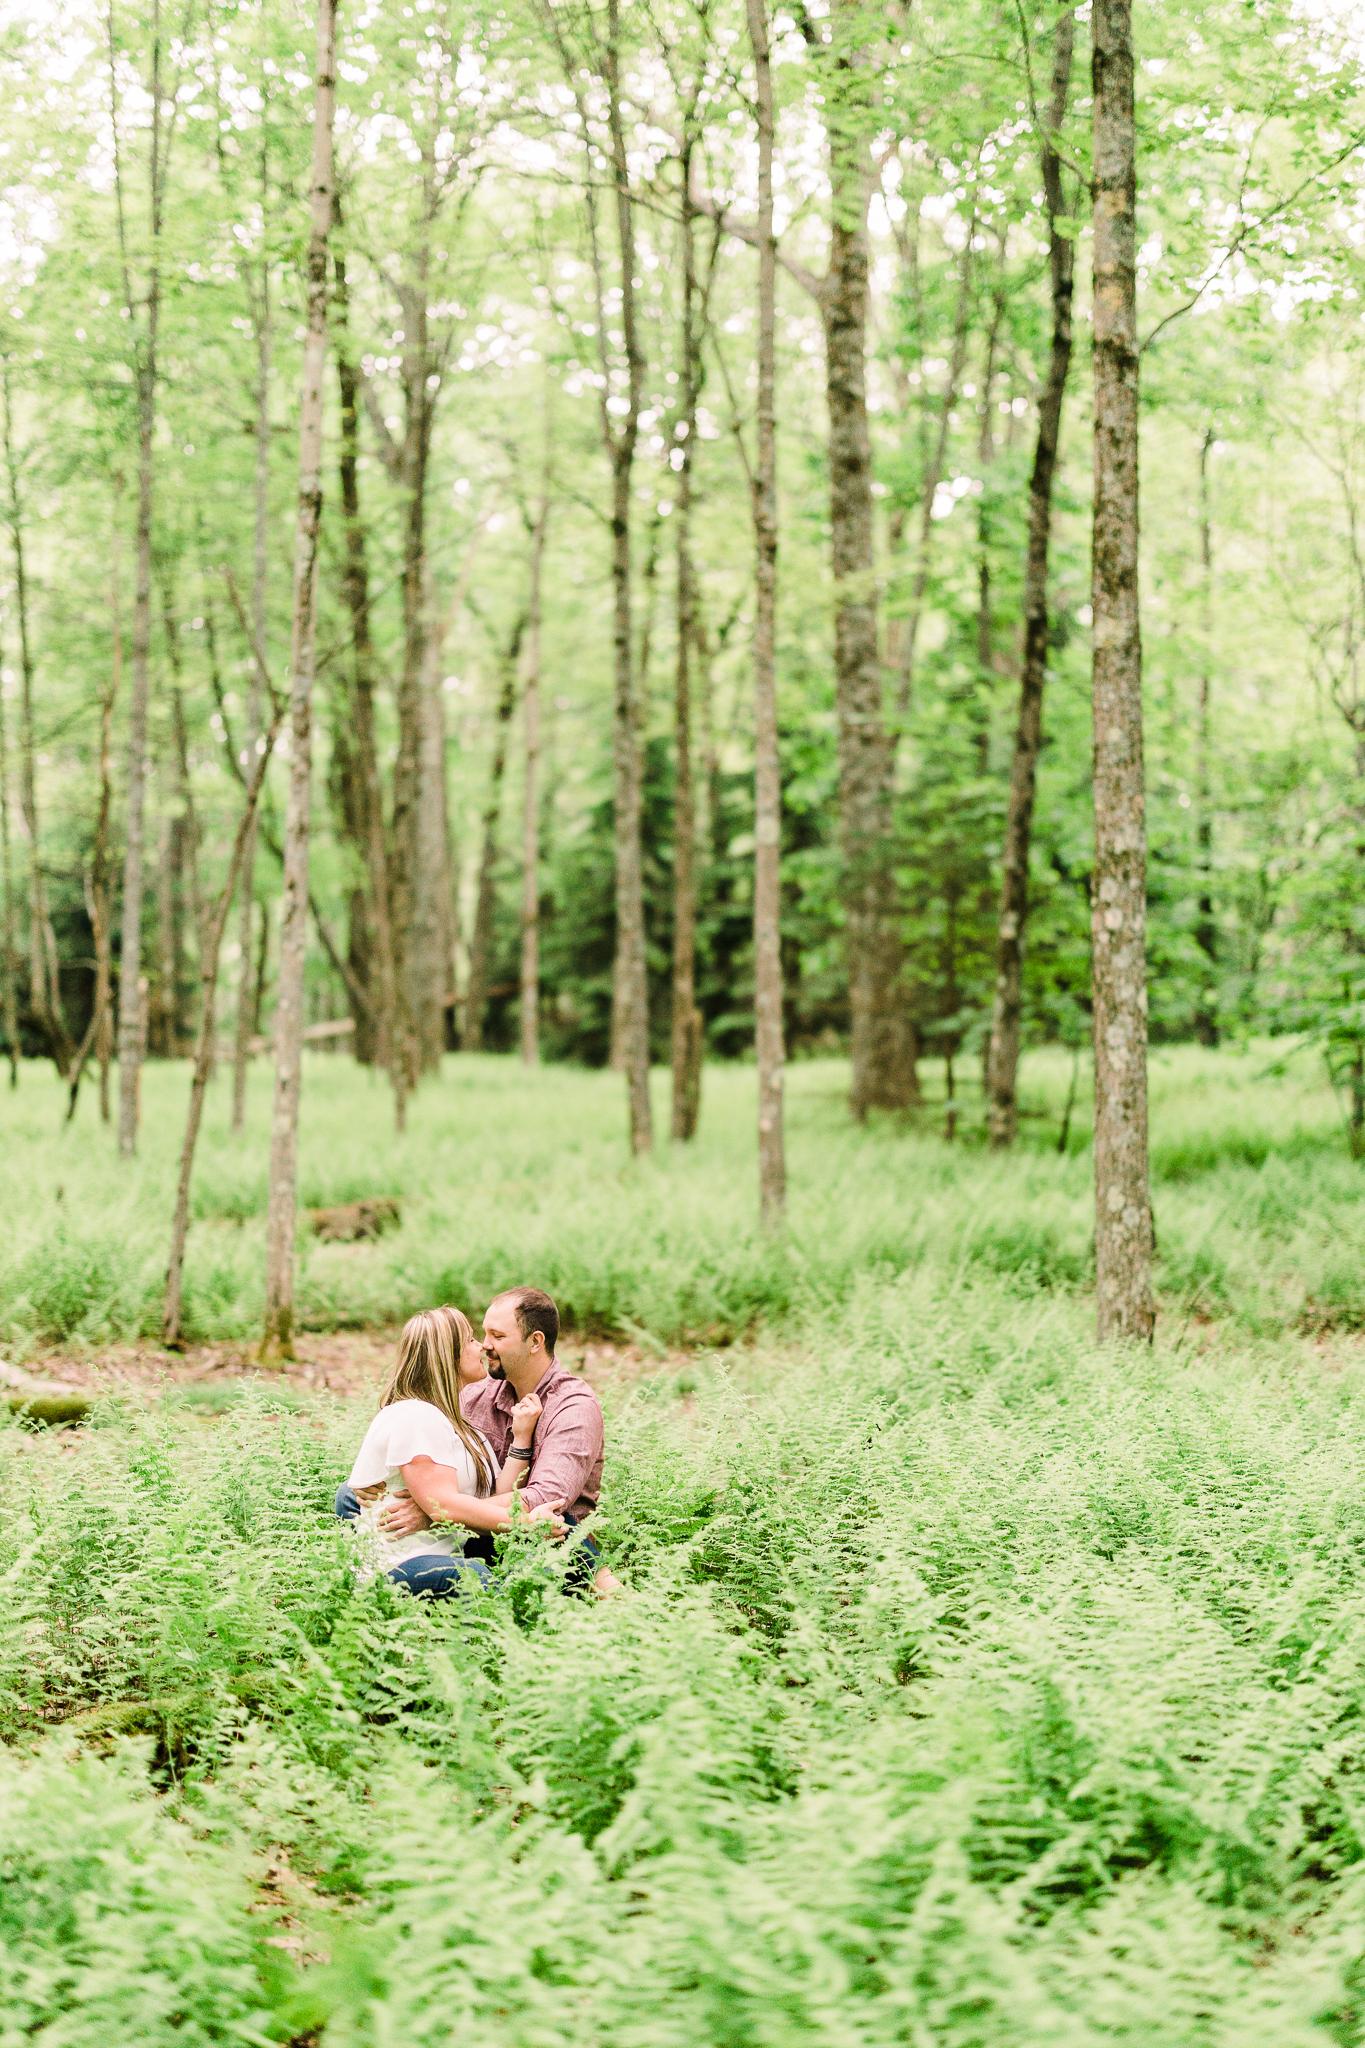 Kettle-creek-state-park-engagement-9304.jpg